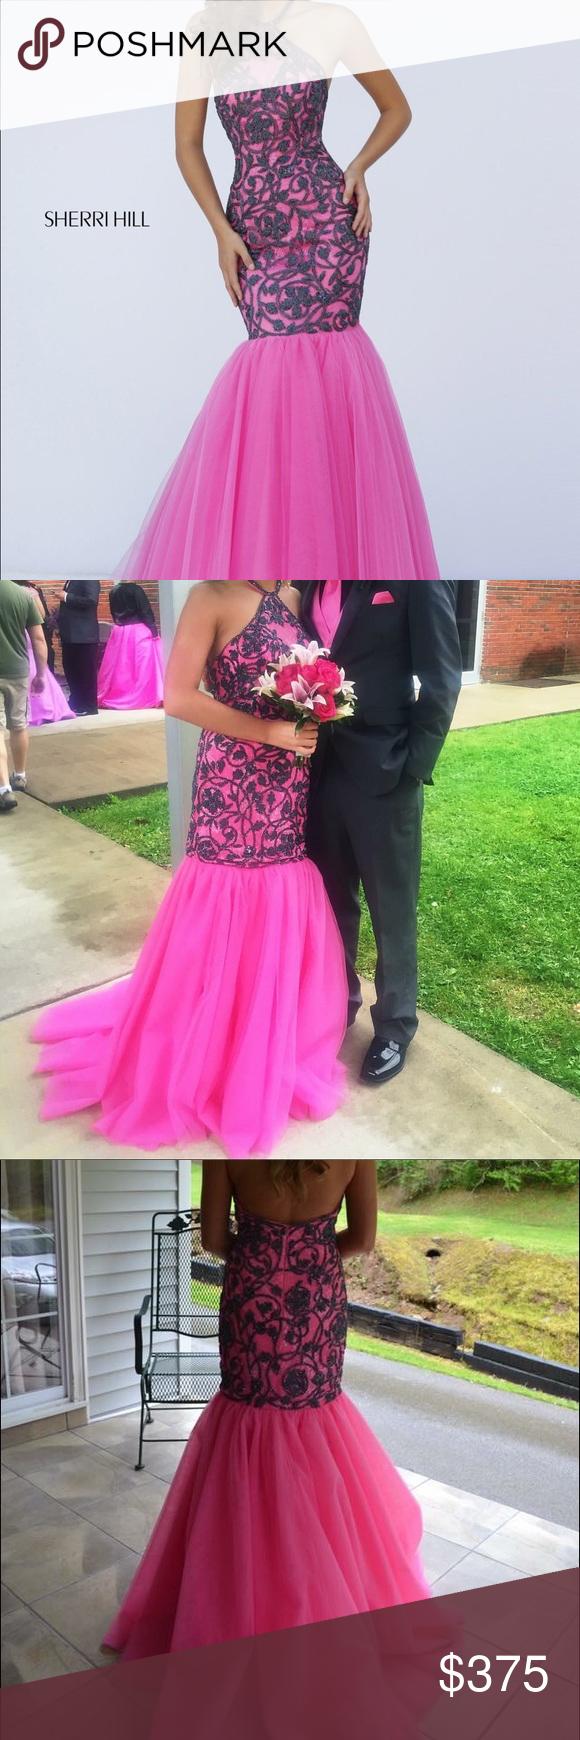 Sherri Hill Spring 2016 Prom Dress | Pinterest | Traje